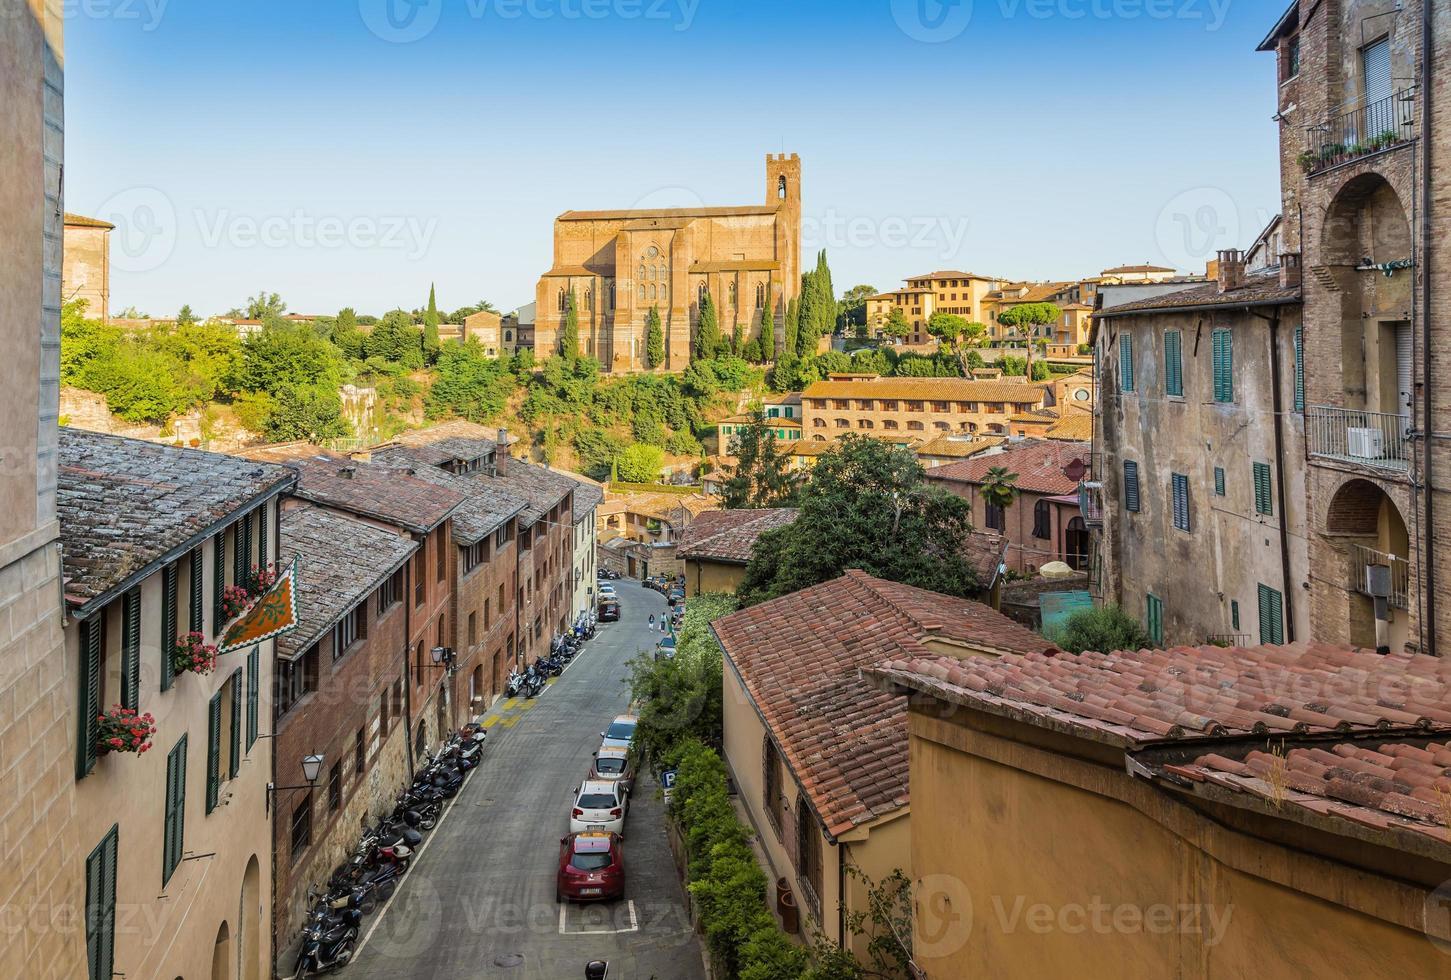 historische Altstadt von Siena, Italien foto